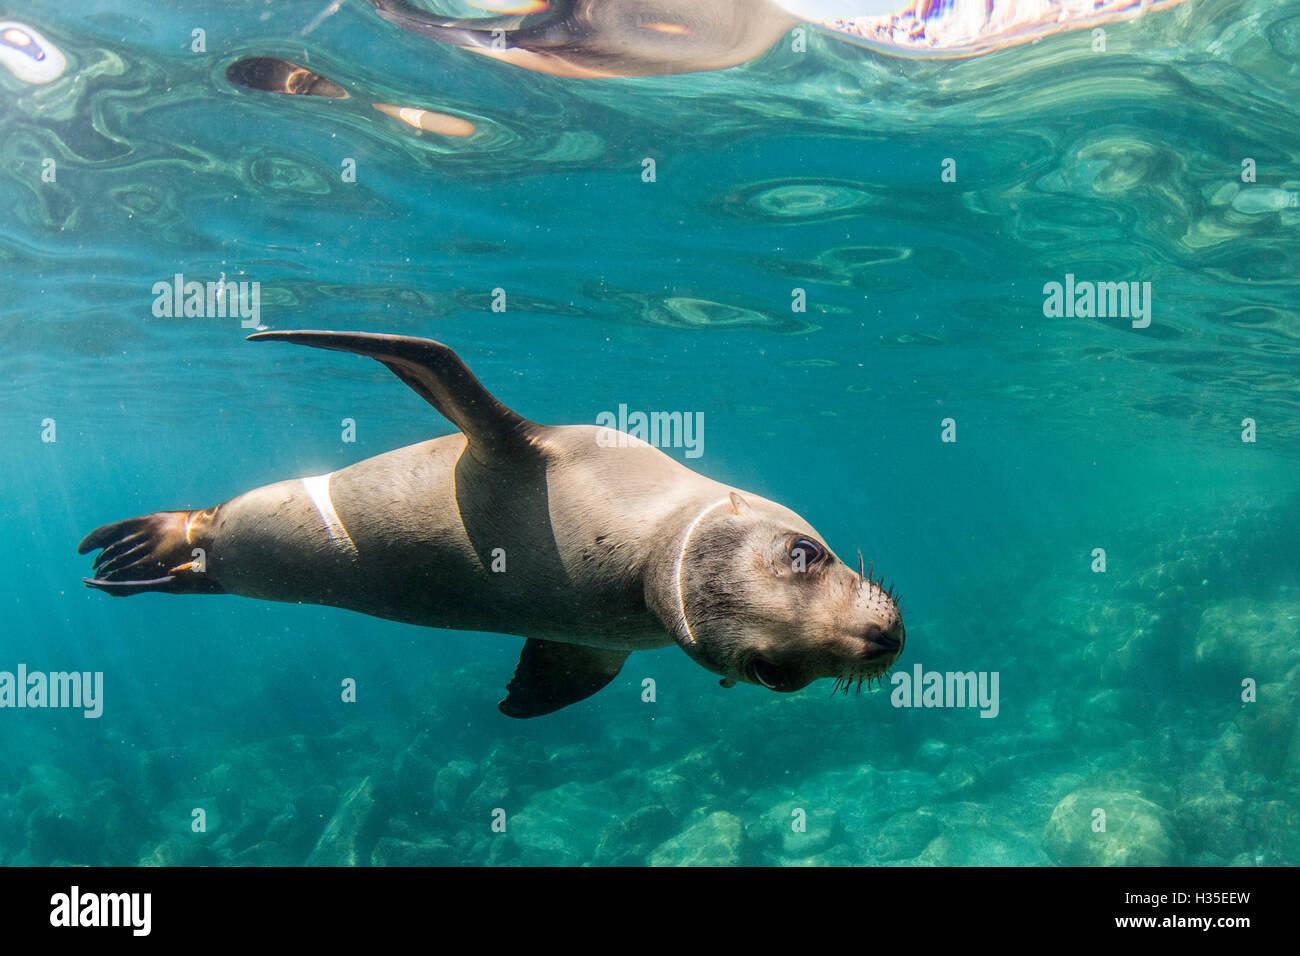 Neugierig kalifornische Seelöwe (Zalophus Californianus) Unterwasser bei Los Islotes, Baja California Sur, Stockbild